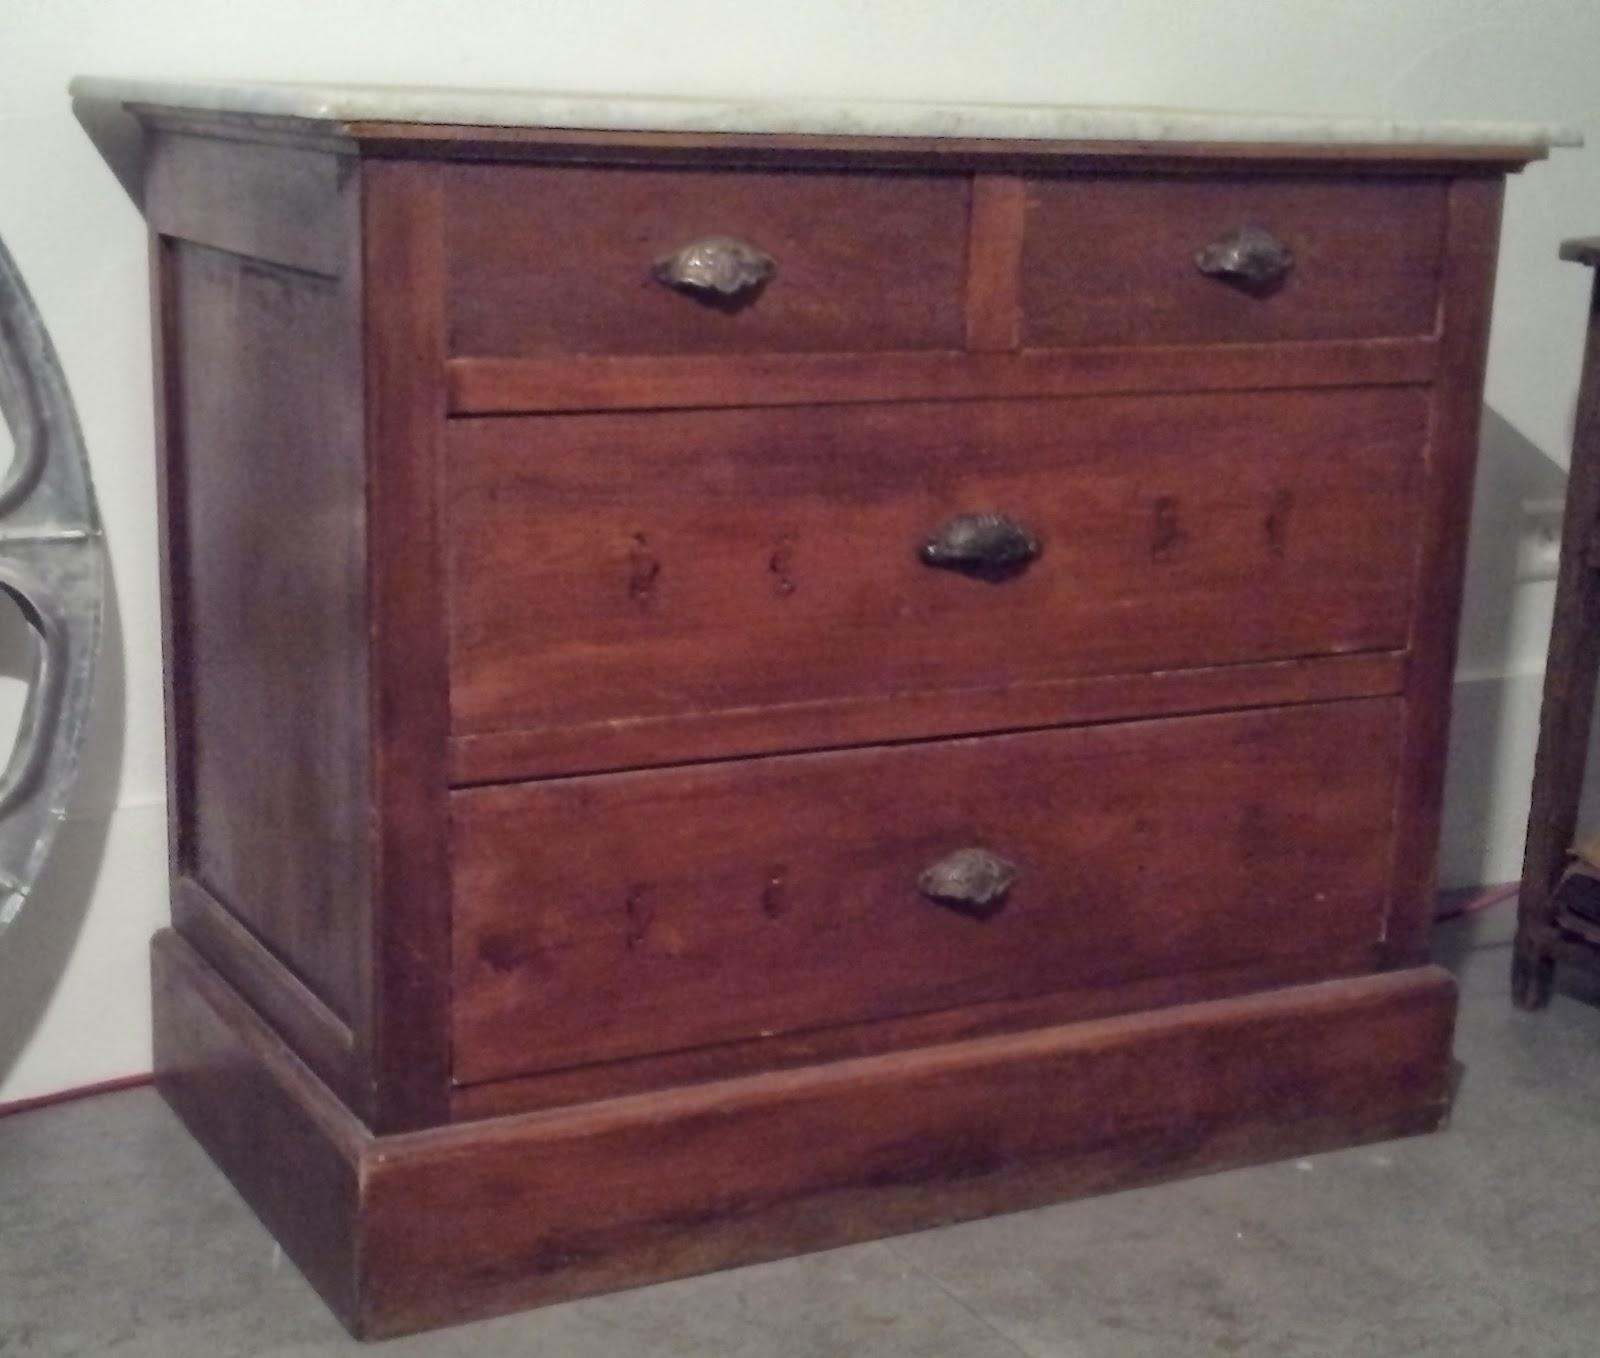 Commode ancienne a tiroirs poign es coquille dessus m - Poignee tiroir commode ...